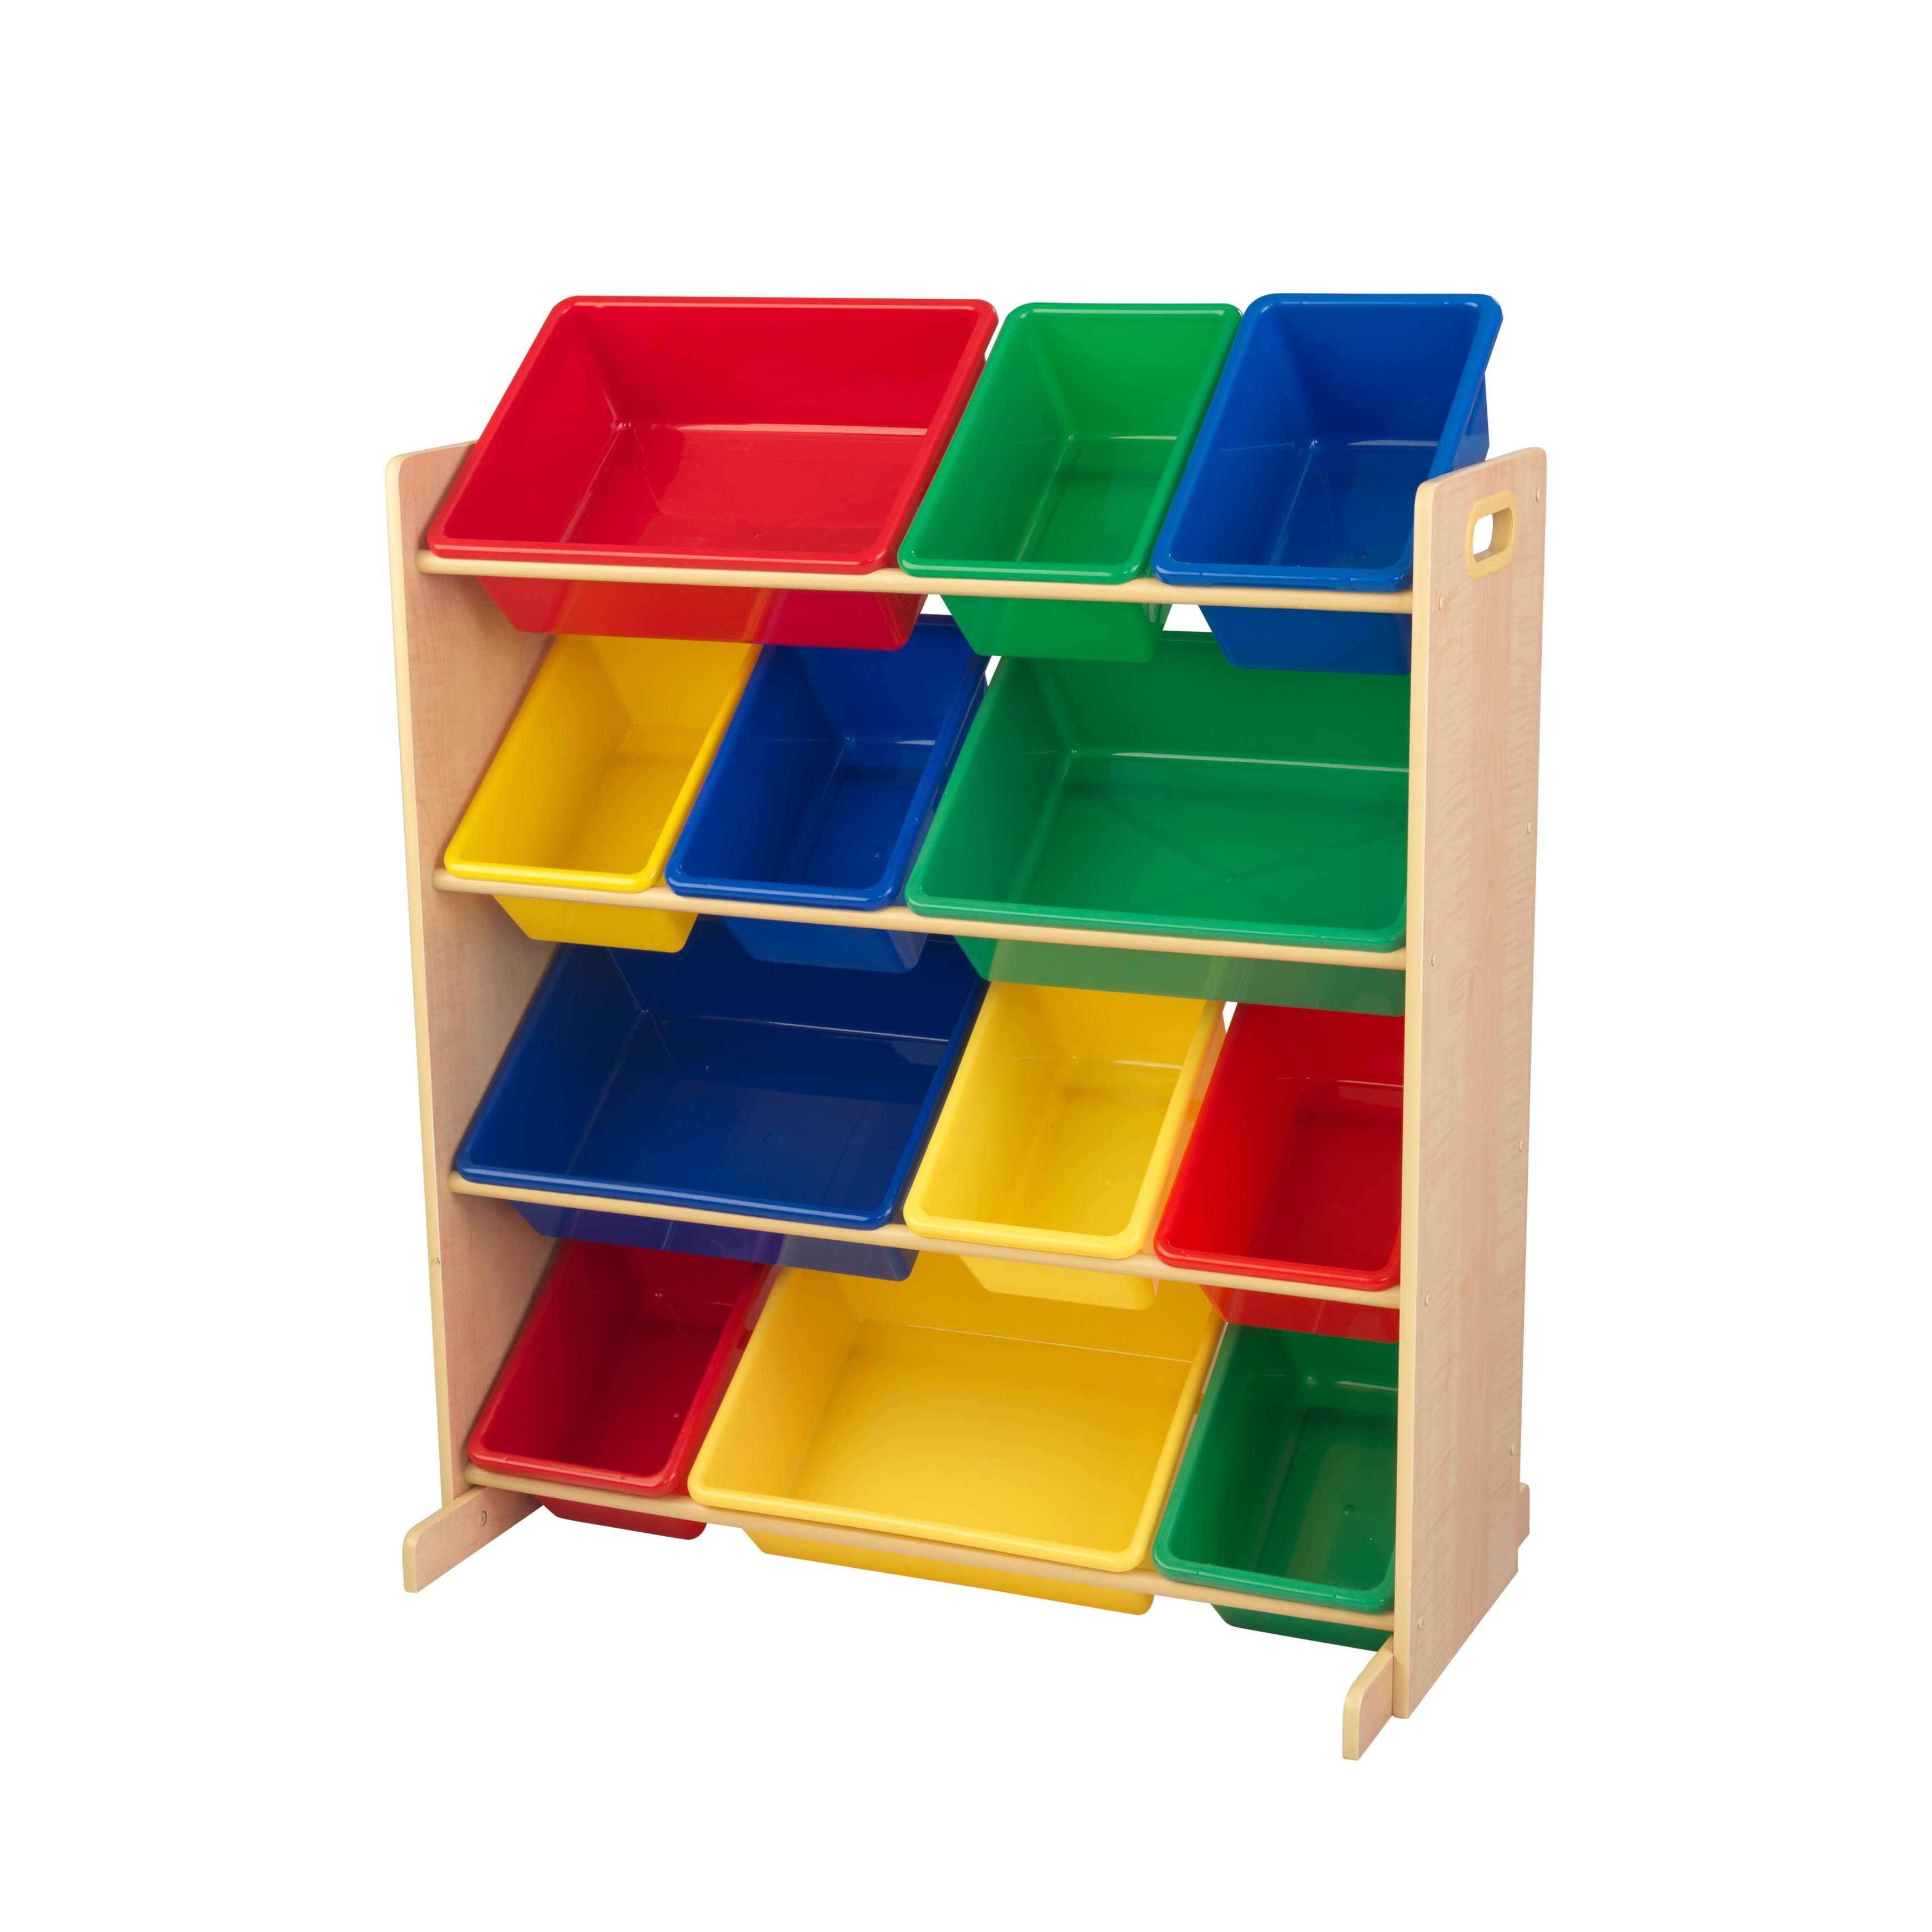 KidKraft Sort It & Store It Bin Unit - Primary & Natural